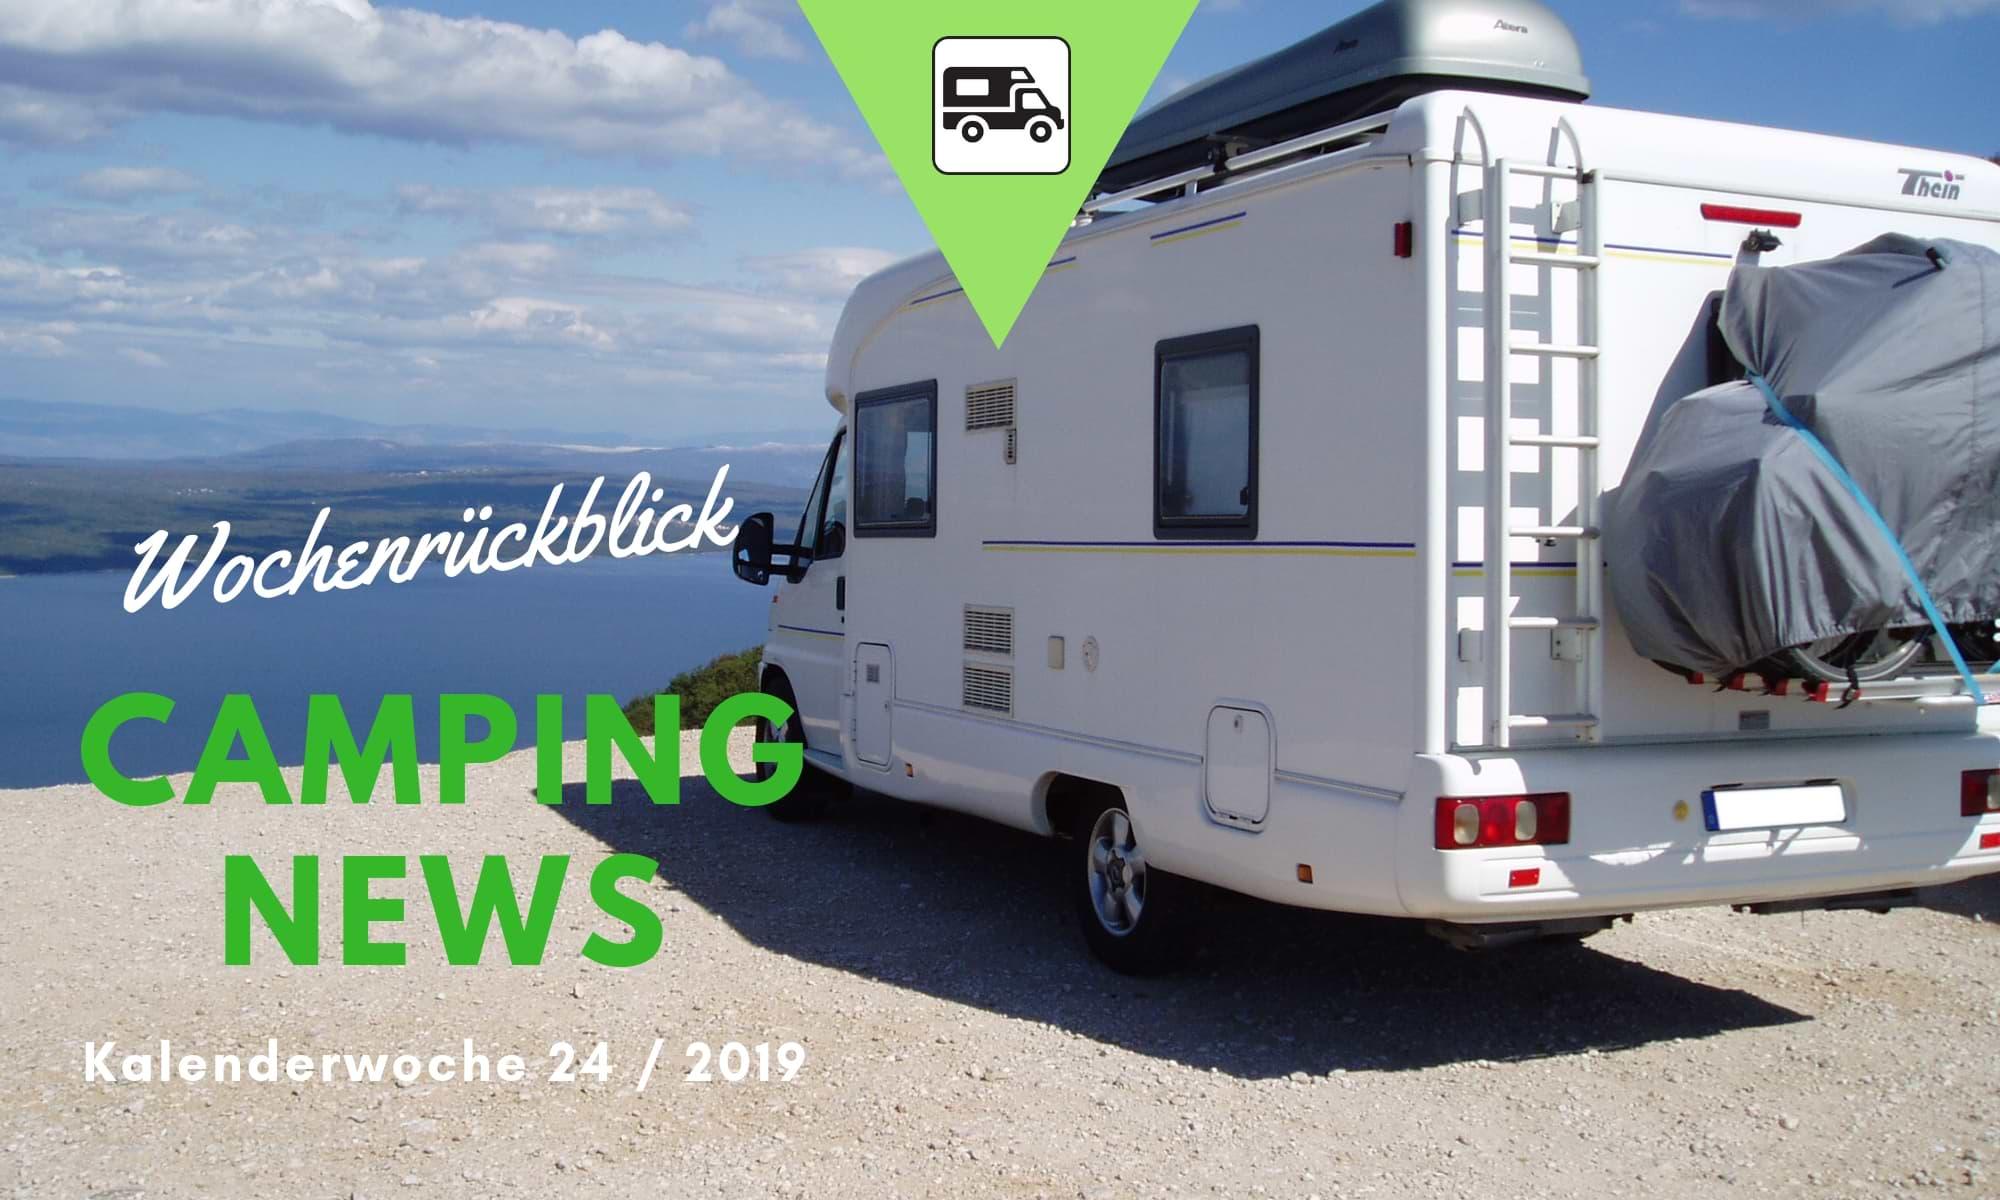 Wochenrückblick Camping News KW24-2019